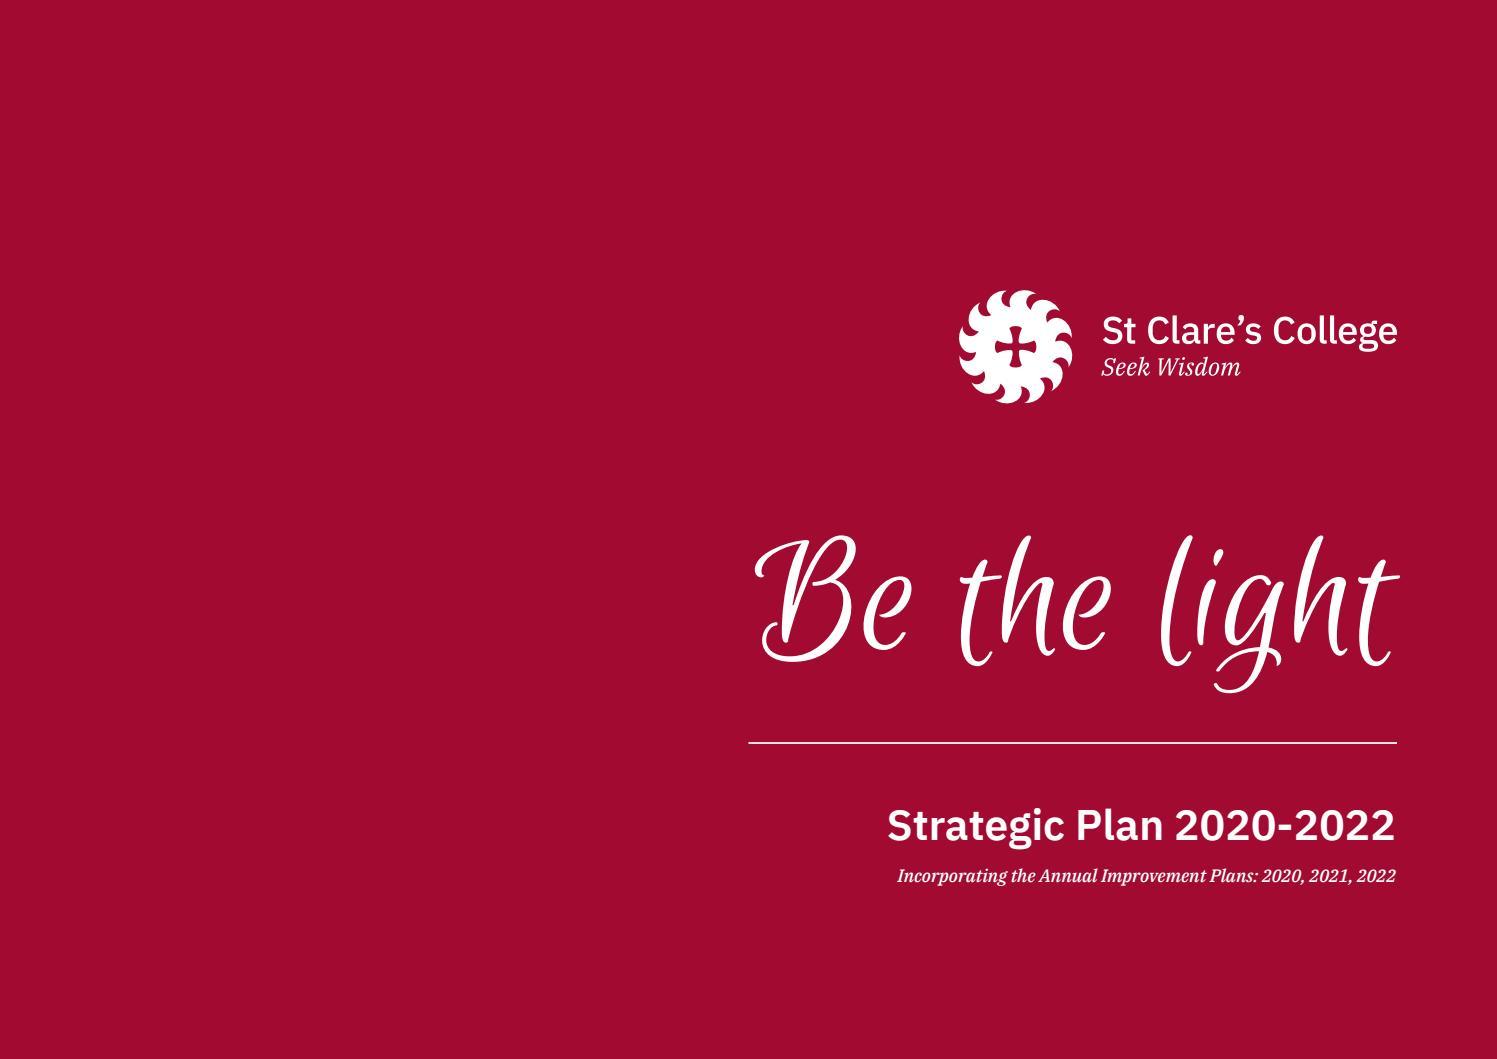 Strategic Plan 2020-2022